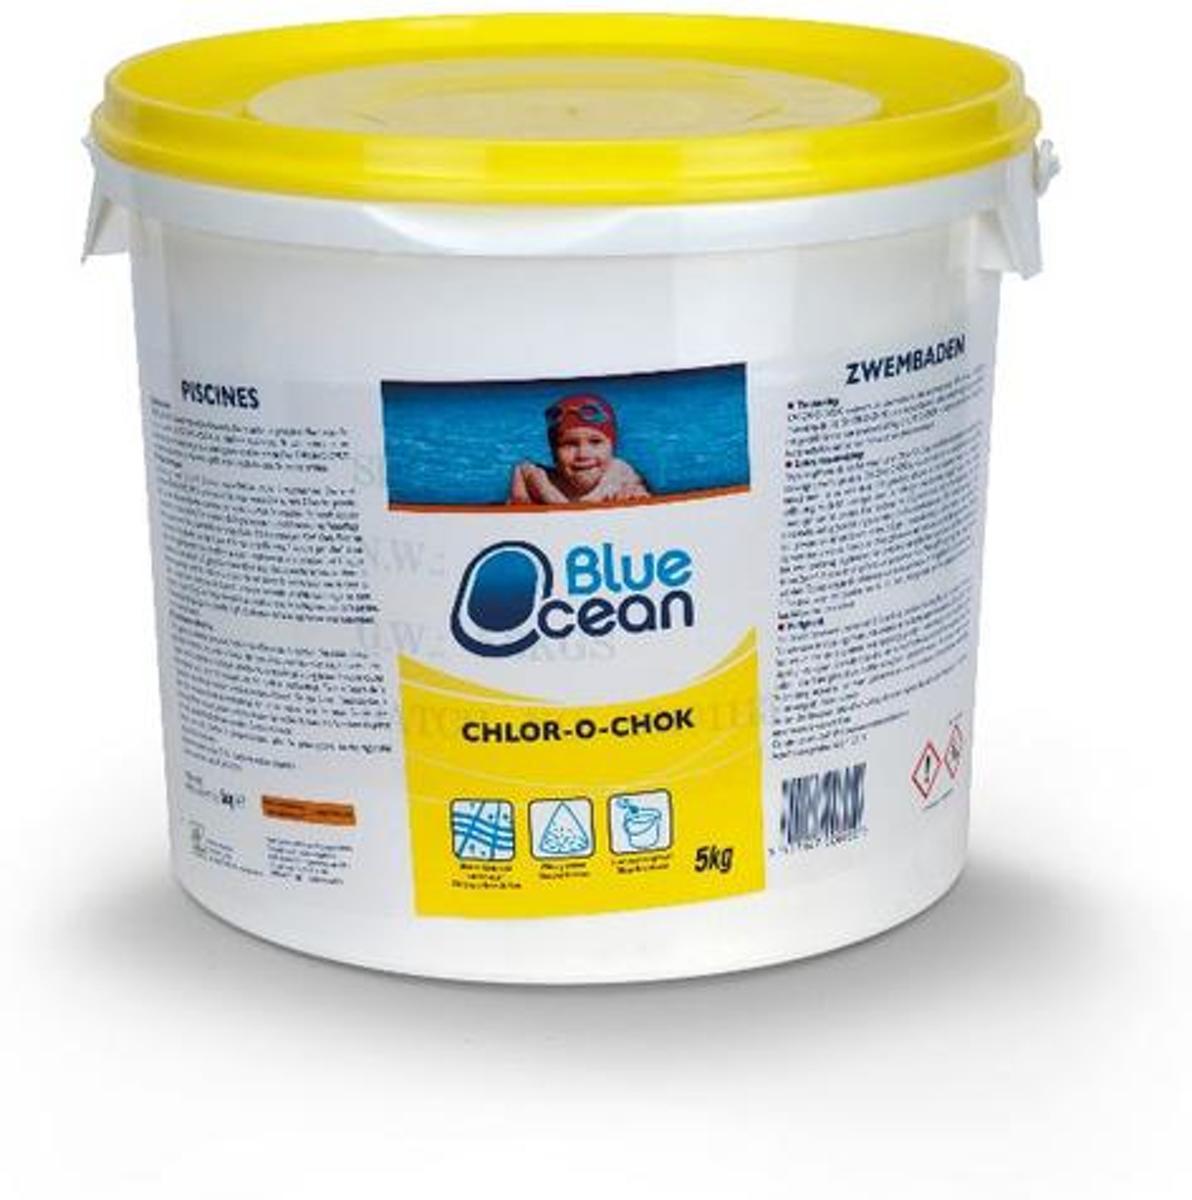 Chloor Zwembad Granulaat 5kg Chlor-o-chok Blue Ocean